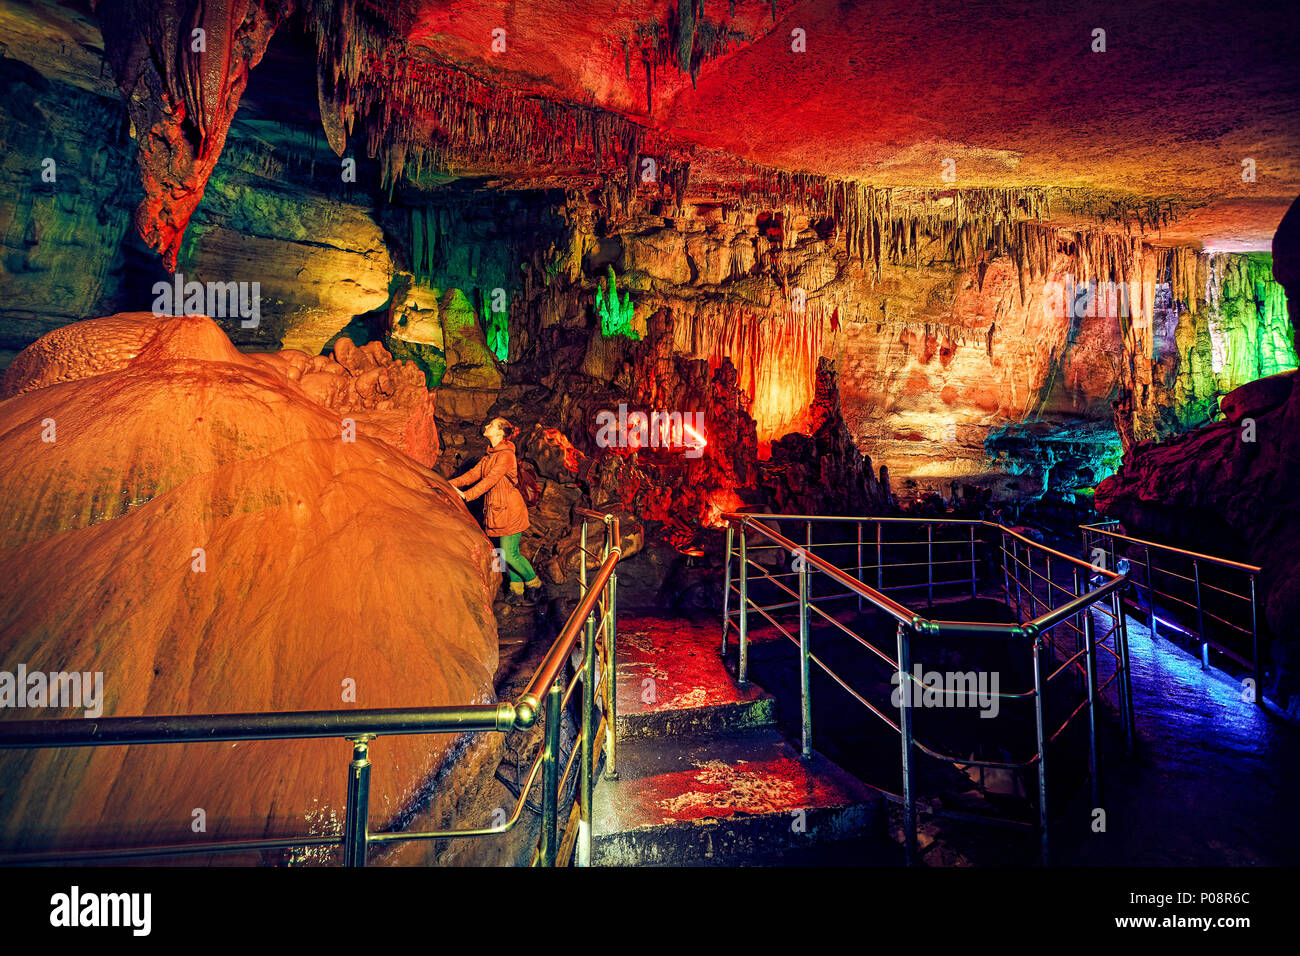 Tourist woman in underground cave Sataplia with colorful illumination in Kutaisi, Georgia - Stock Image